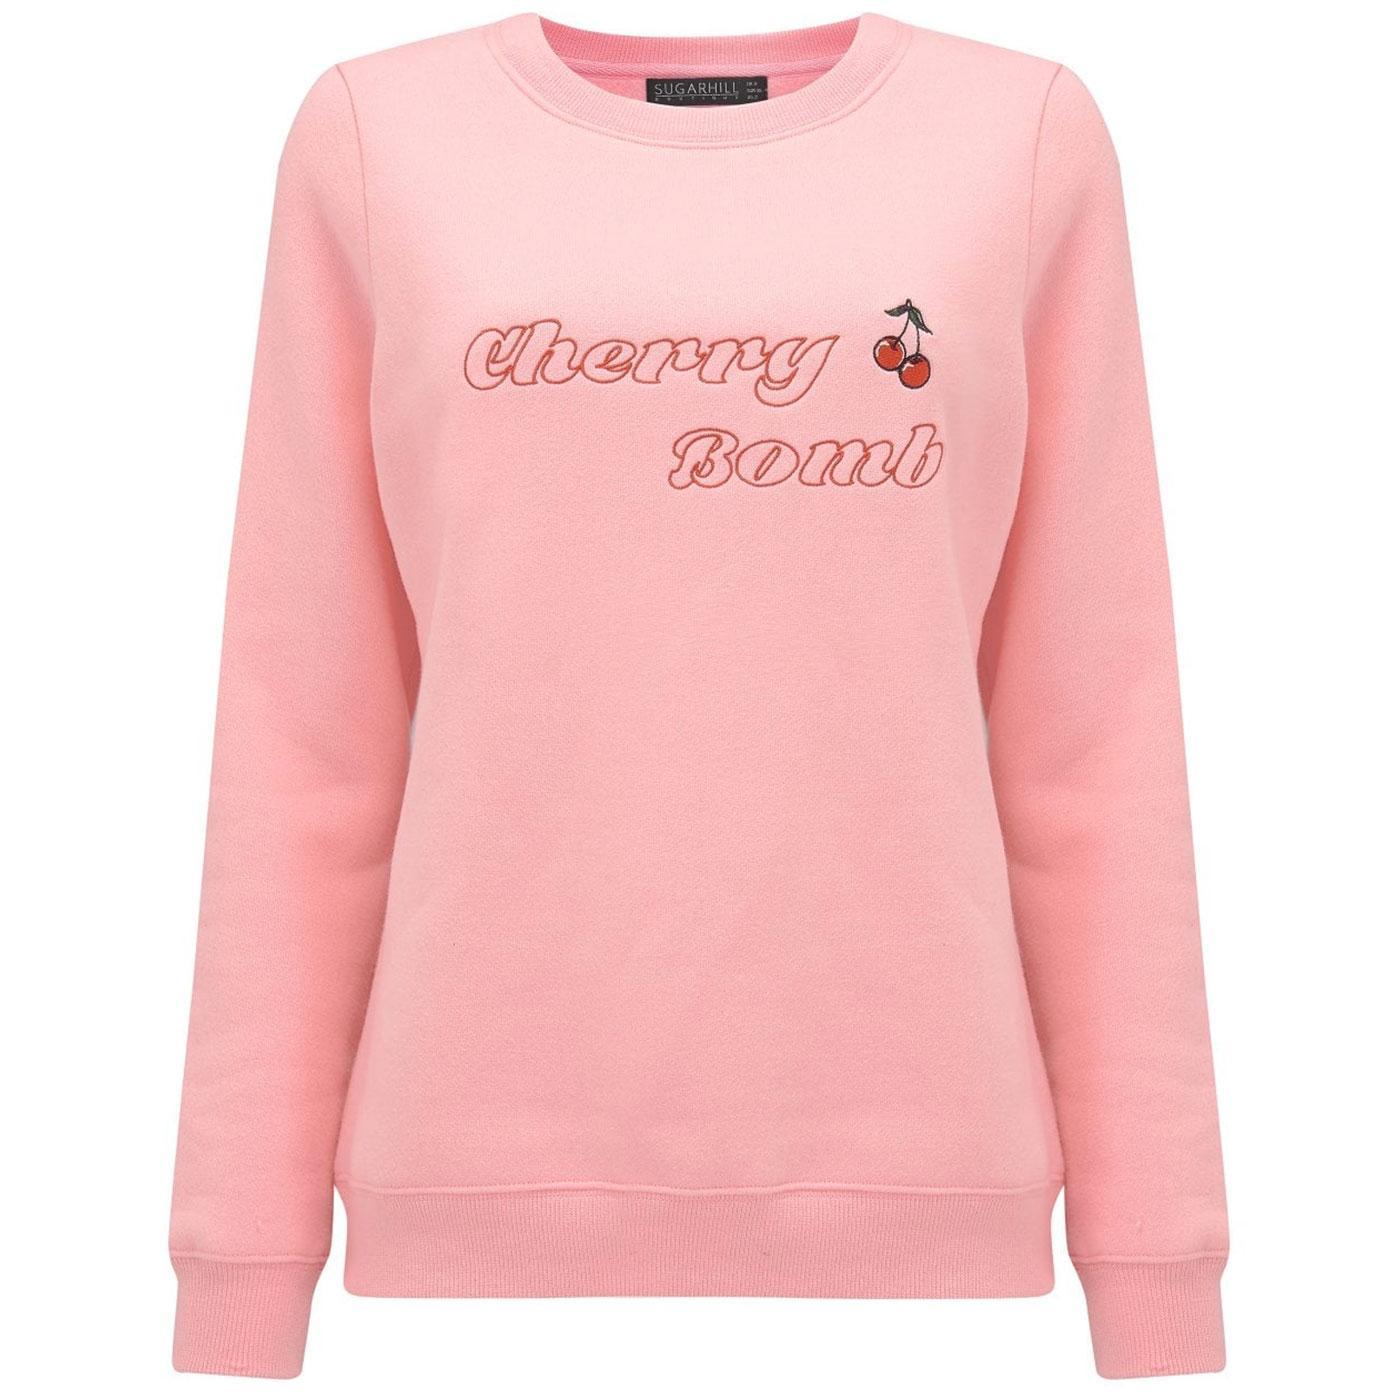 Alanis SUGARHILL BOUTIQUE Cherry Sweatshirt Pink